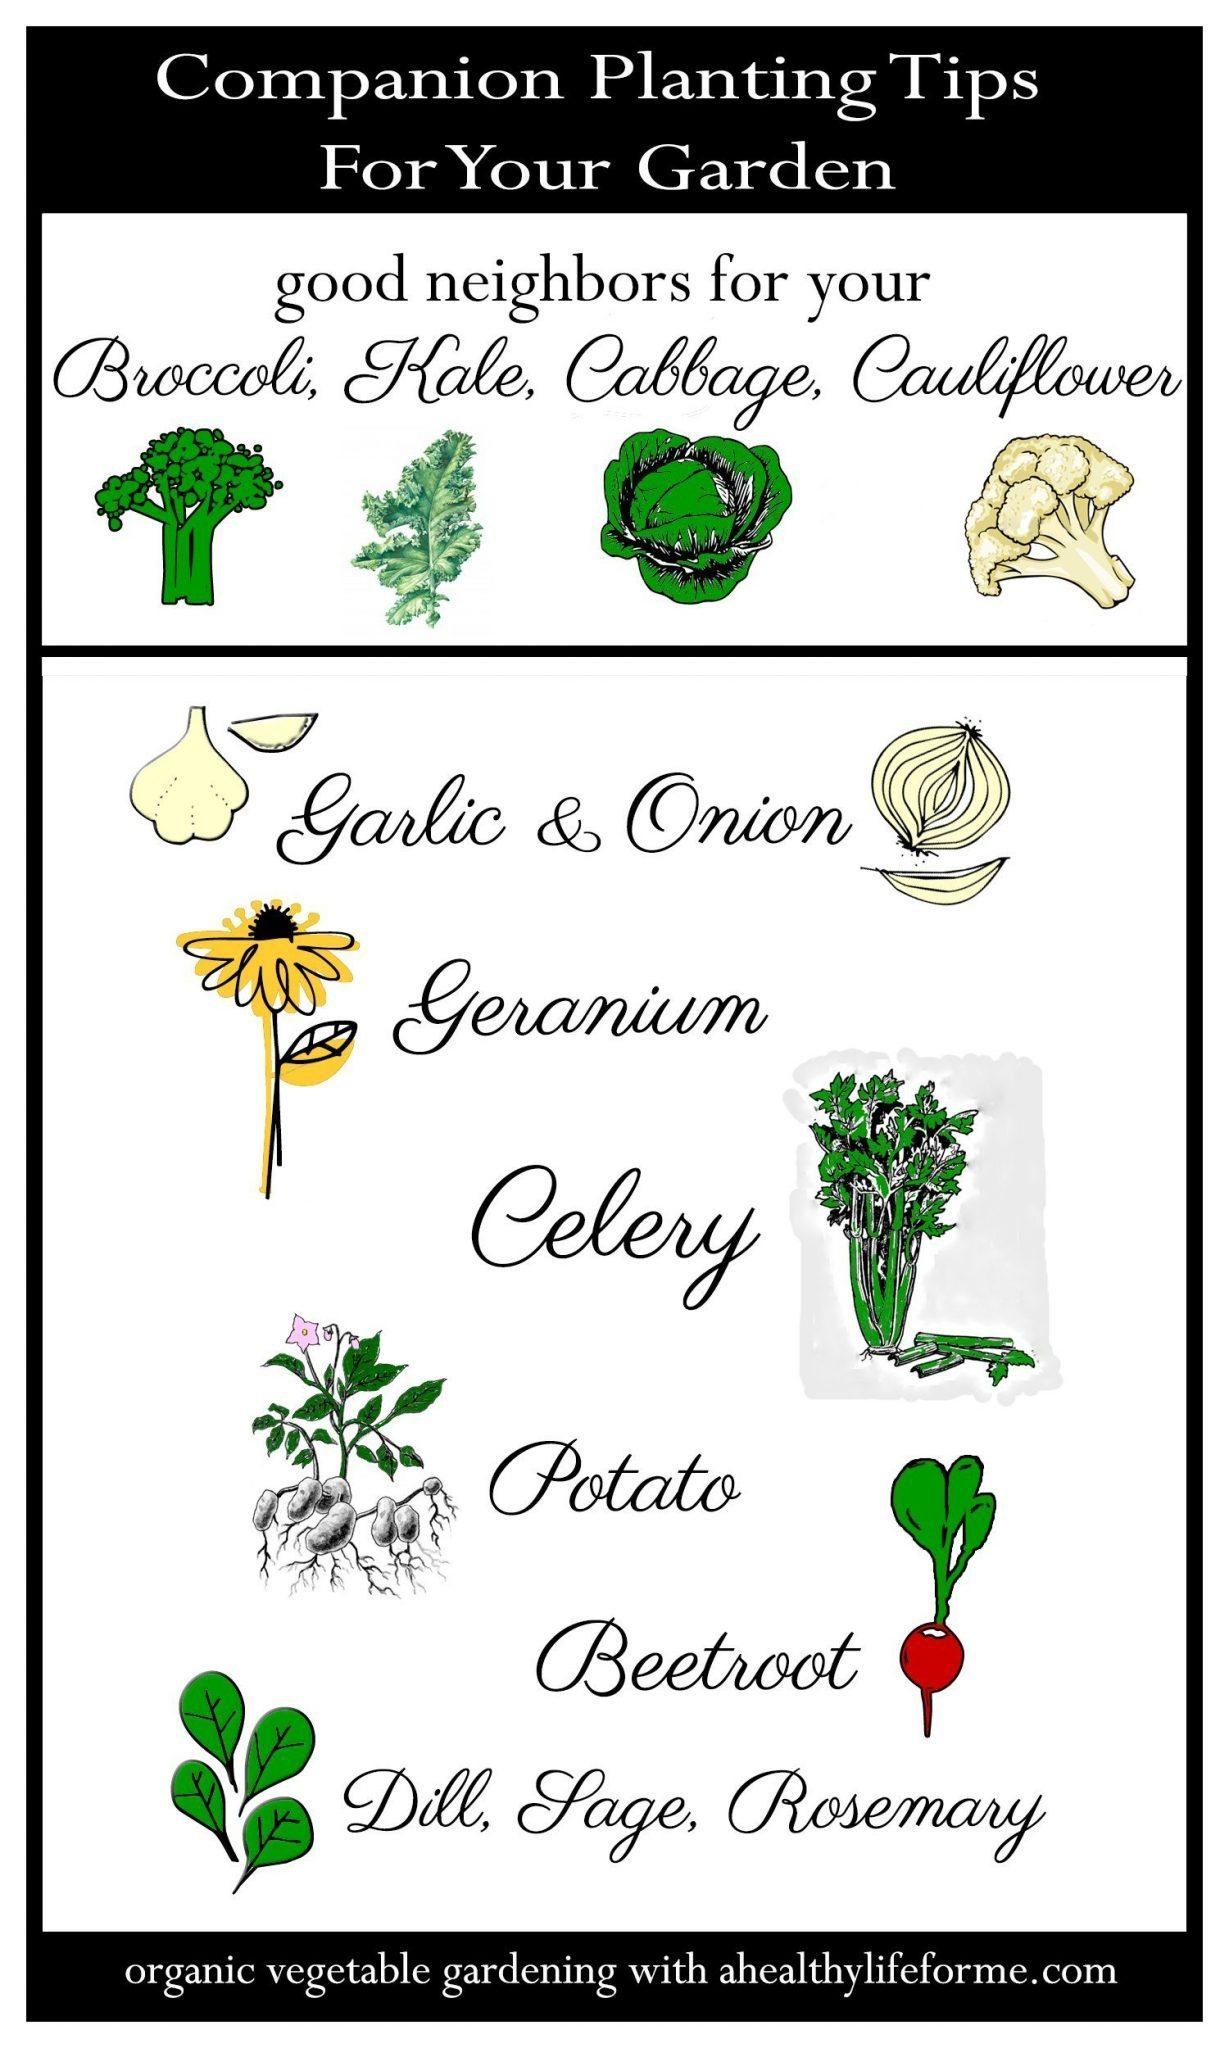 Companion Planting Tips for Cruciferous Vegetables - A ... Companion Planting Kale